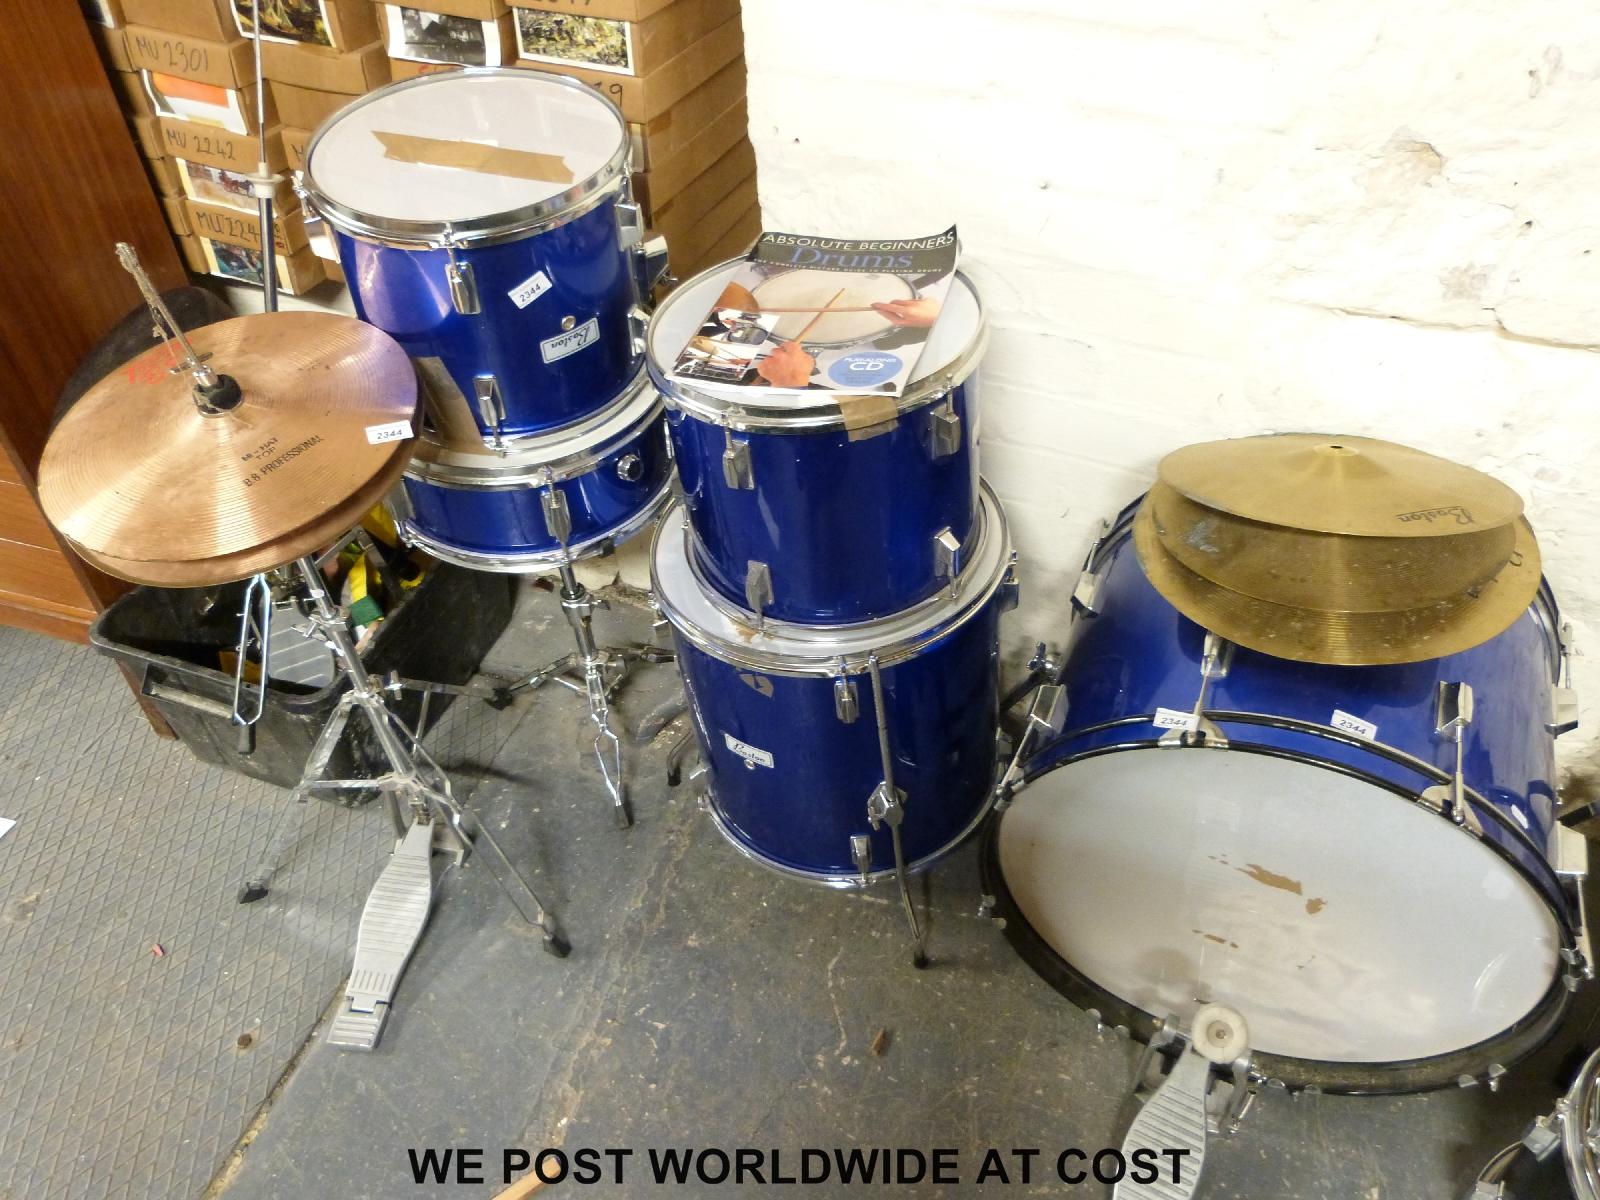 Lot 2344 - A Boston Drum kit in blue lacquer finish with Stagg drum stool and & A Boston Drum kit in blue lacquer finish with Stagg drum stool and ... islam-shia.org